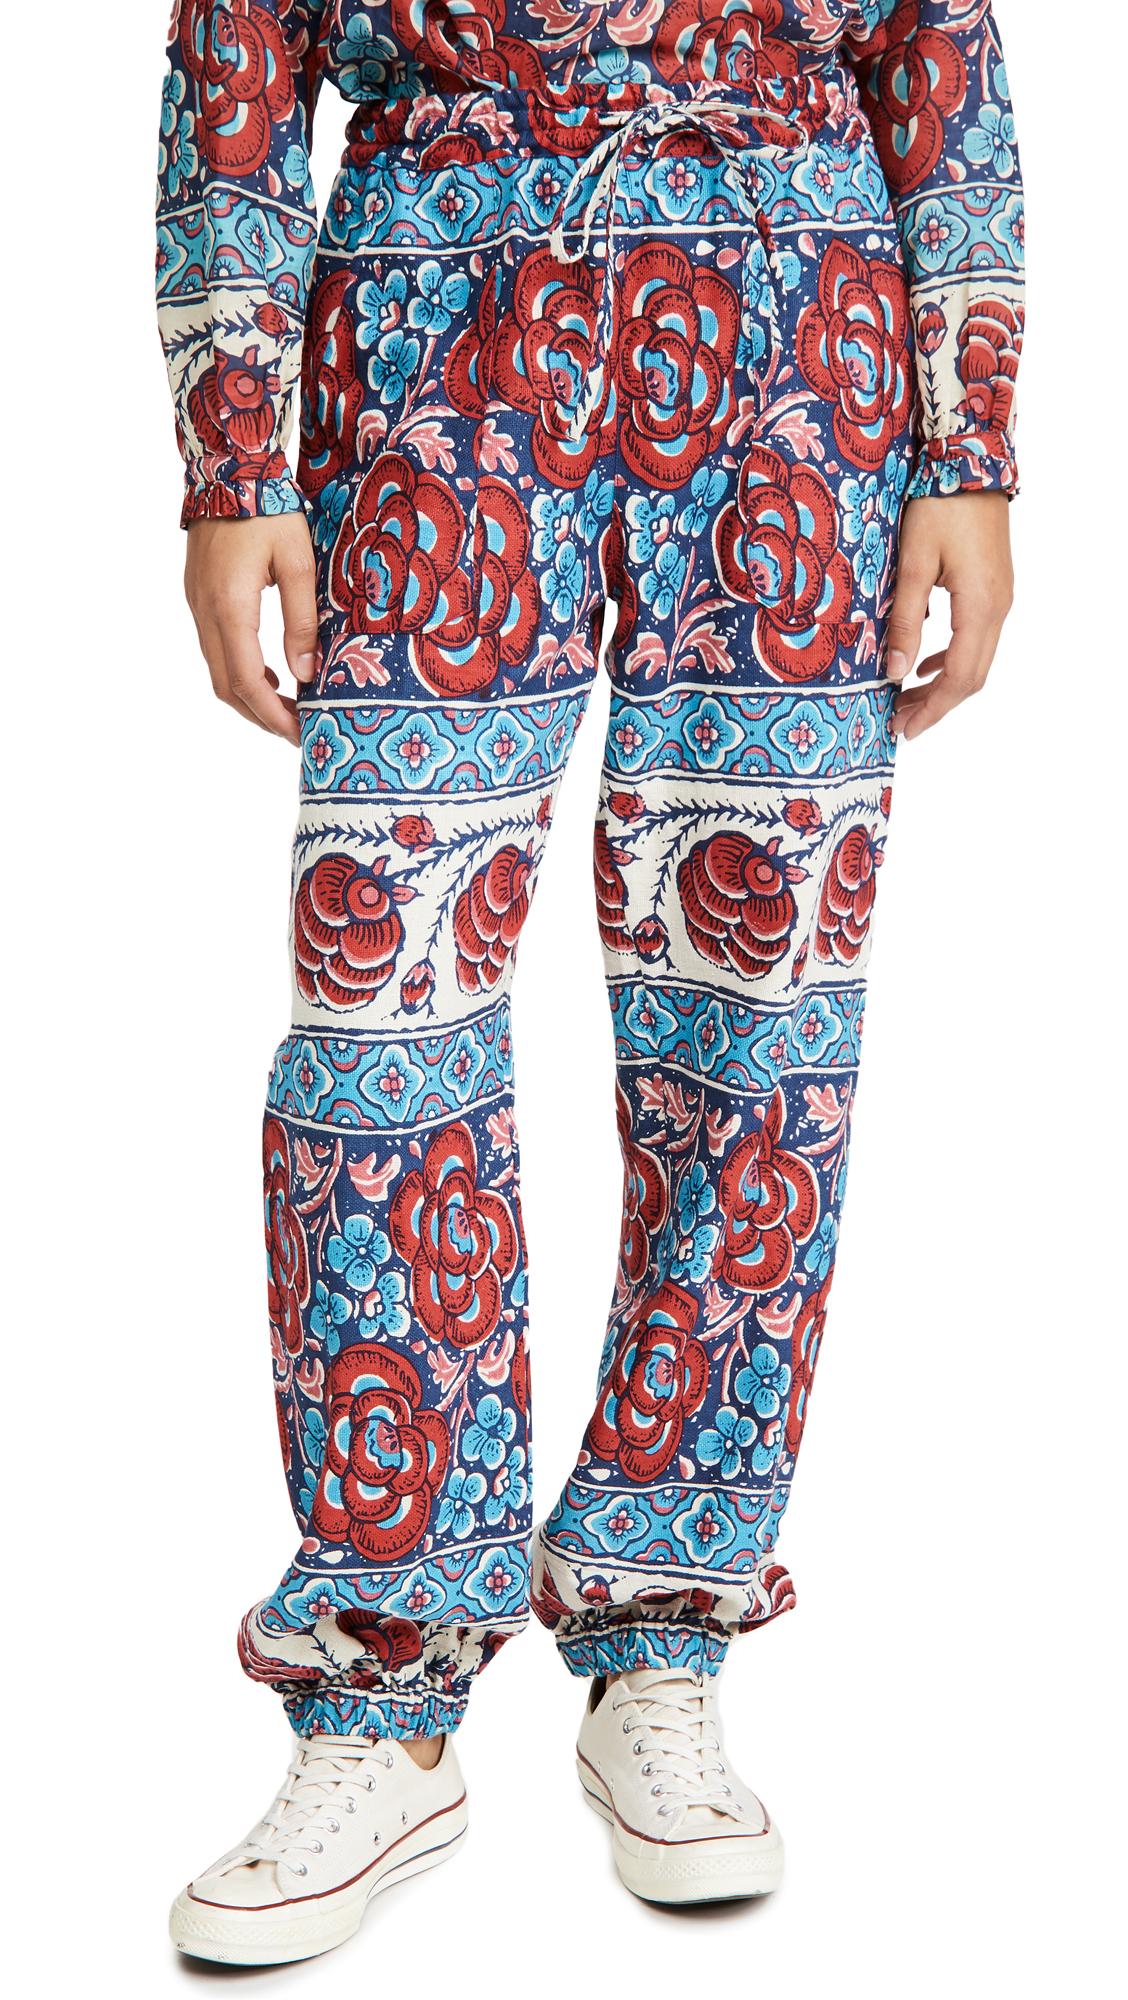 Warm Joggers Pants